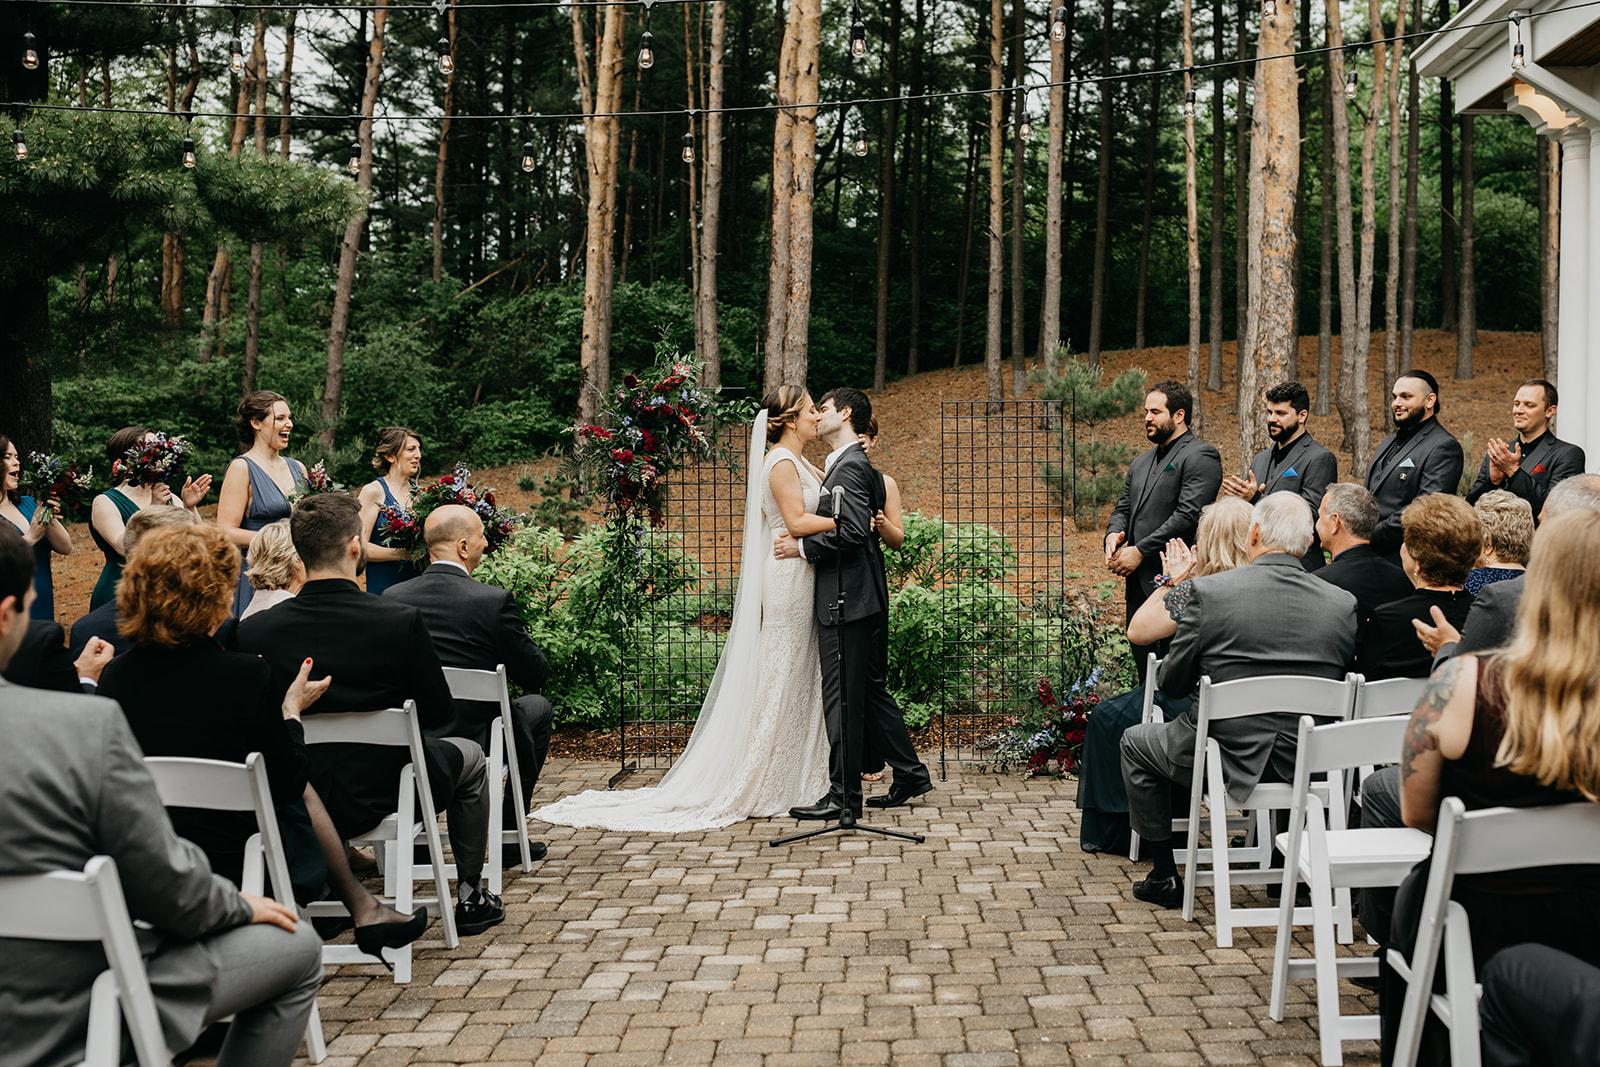 2019-06-01-00-Lindsey+Mat-06_Ceremony-meandhimphoto-0067-K5D44657-Edit.jpg